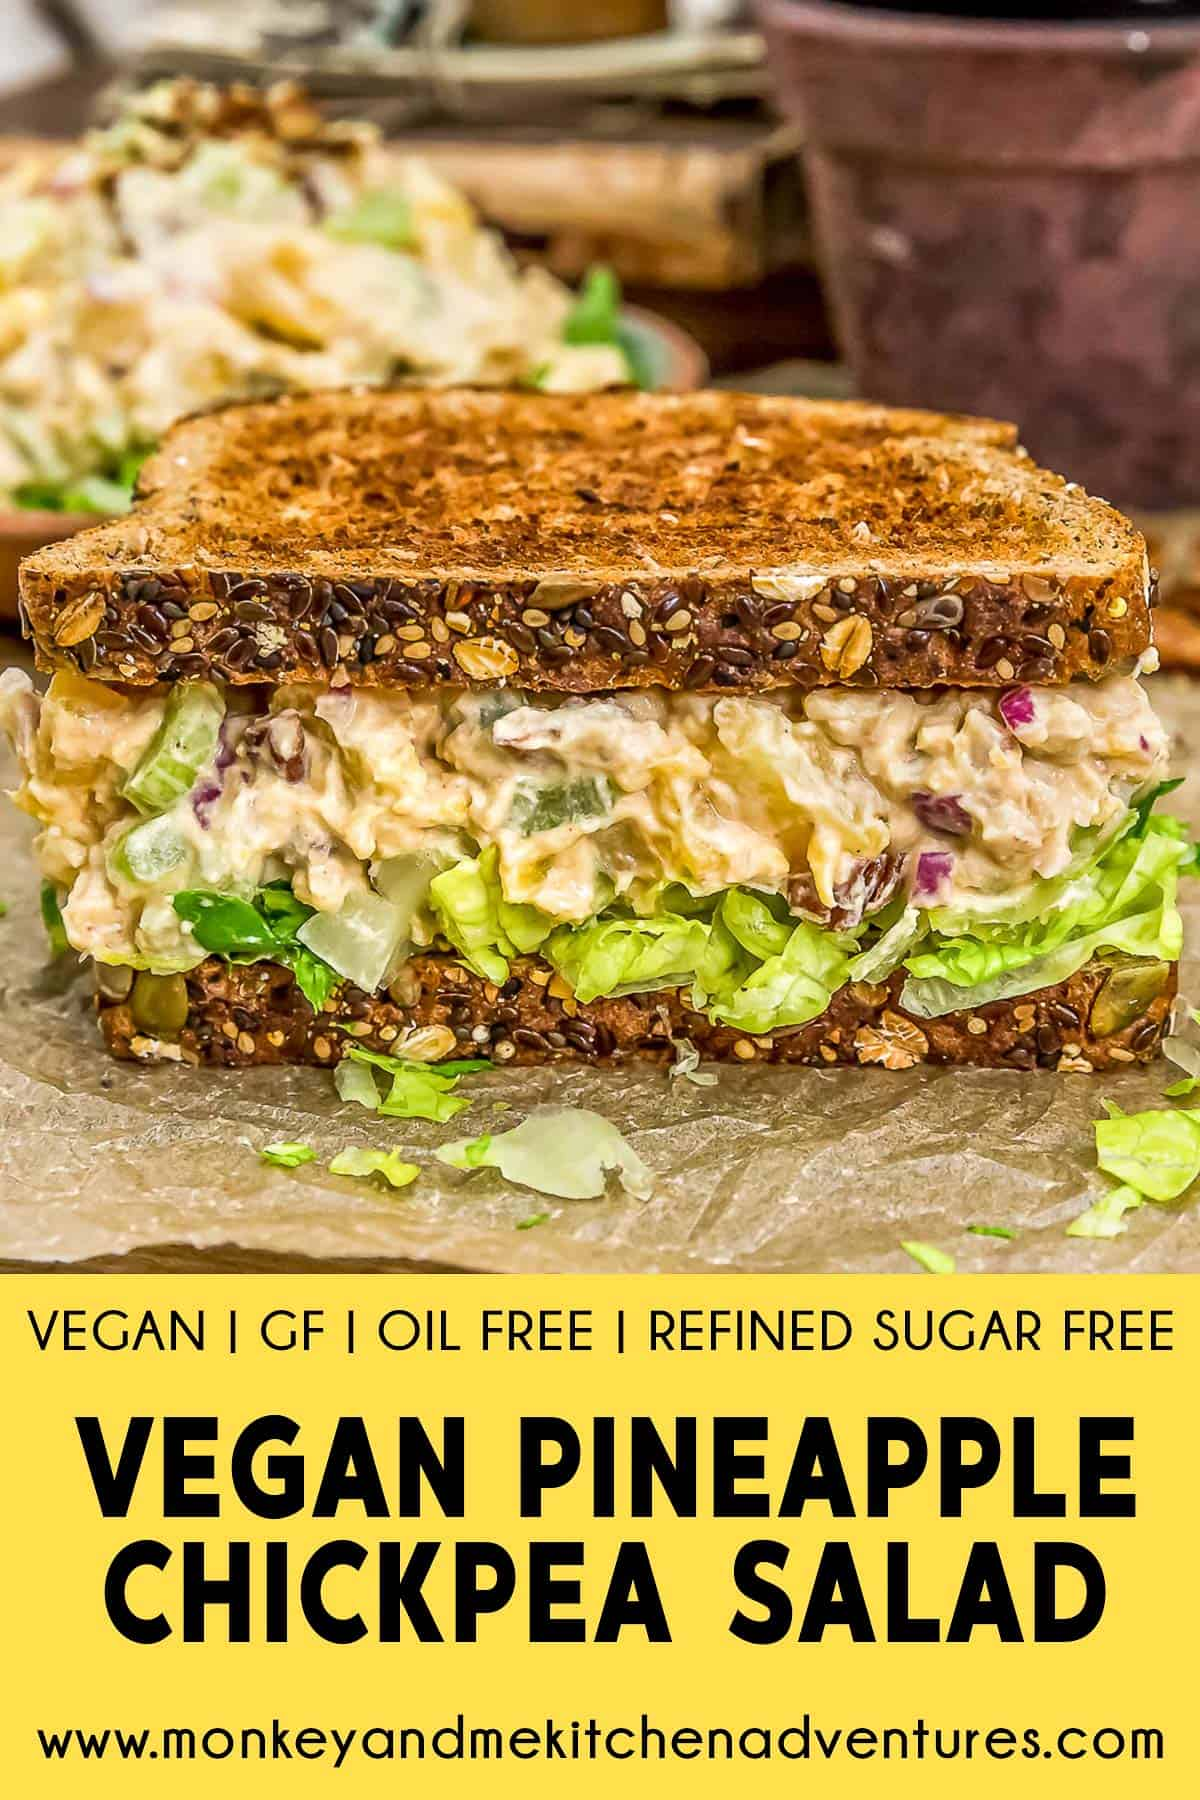 Vegan Pineapple Chickpea Salad with text description